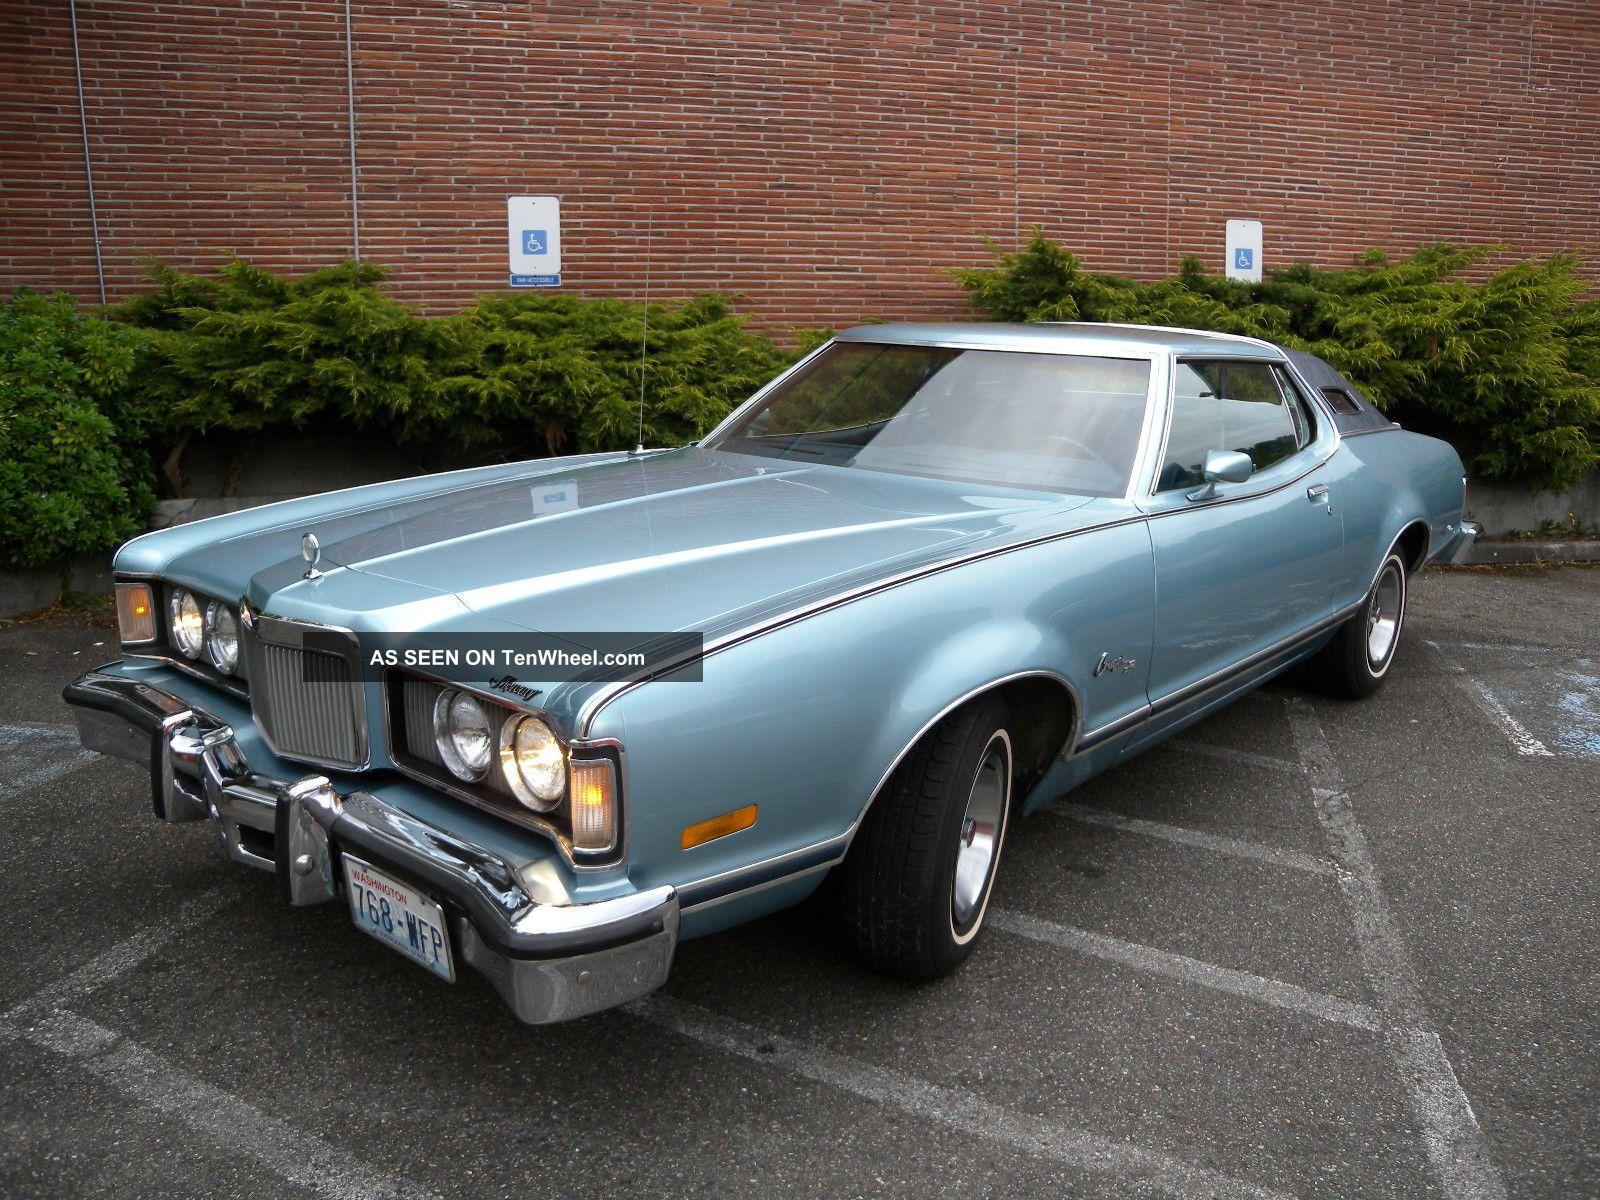 1976 Mercury Cougar Xr7 Blue Landau 2 Door 94,  700 Mi.  All Cougar photo